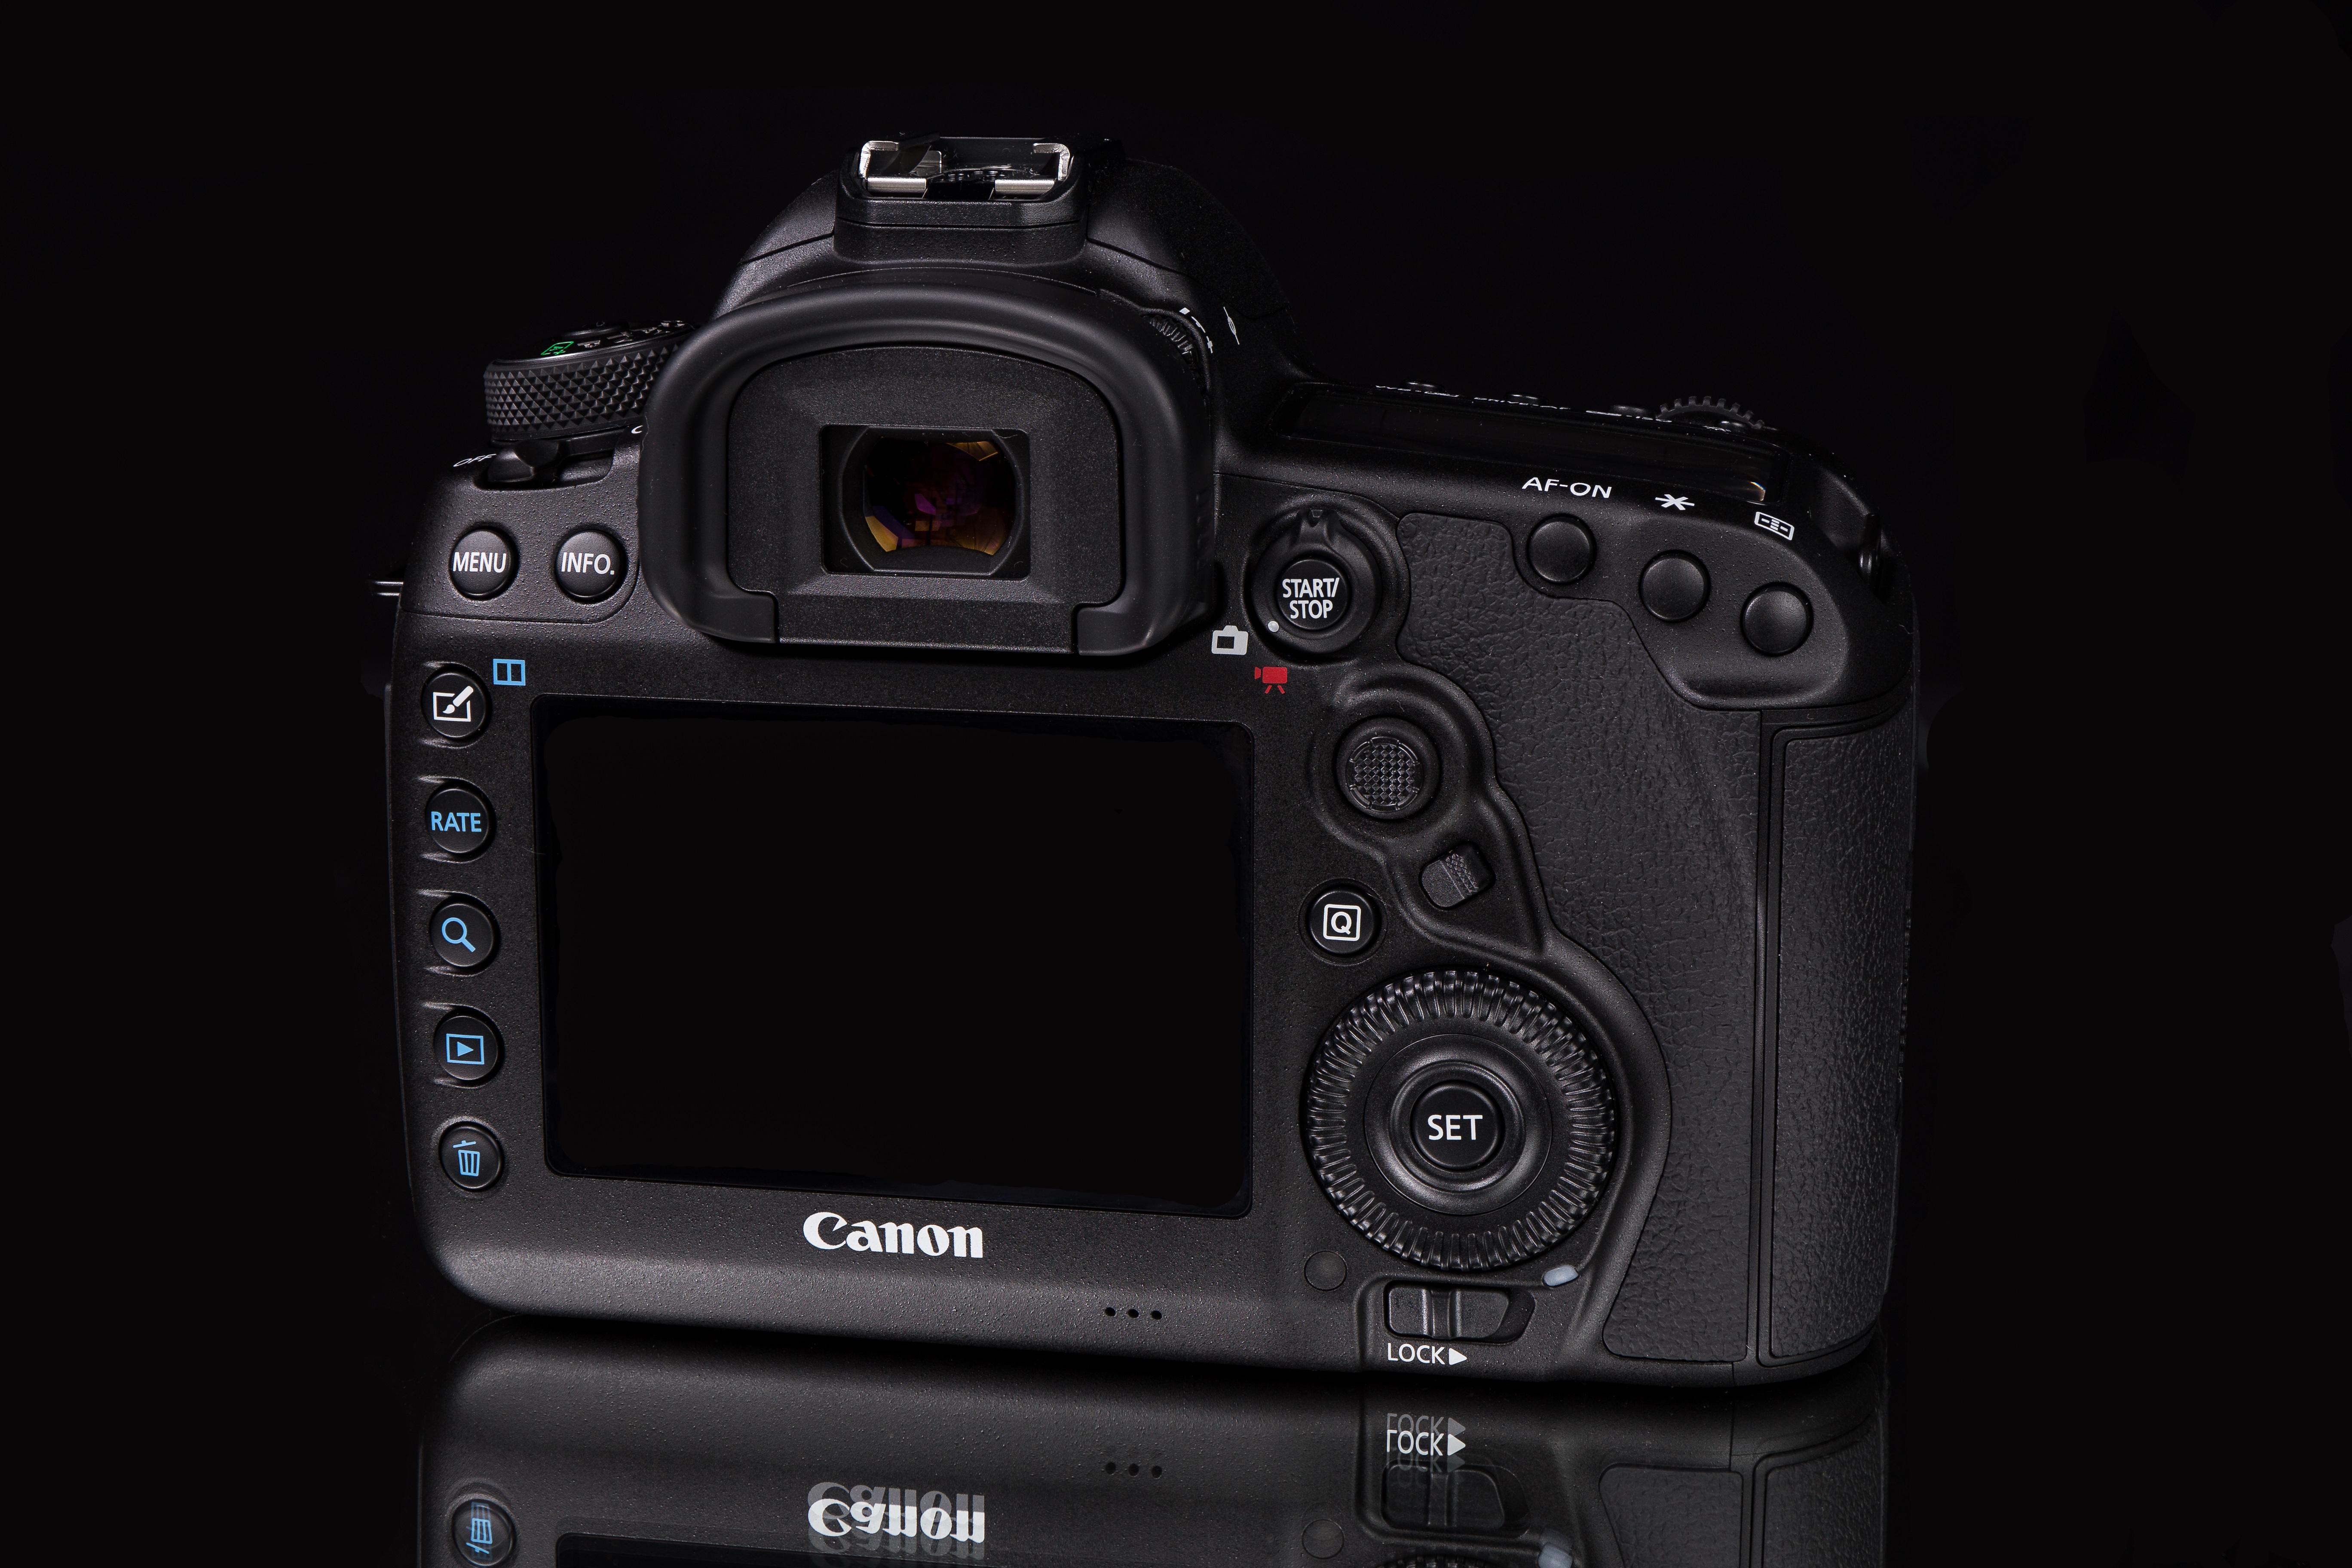 Filecanon Eos 5d Mark Iv Rear 1803241121 Ako Wikimedia Canon Body Only Camera Dslr 4